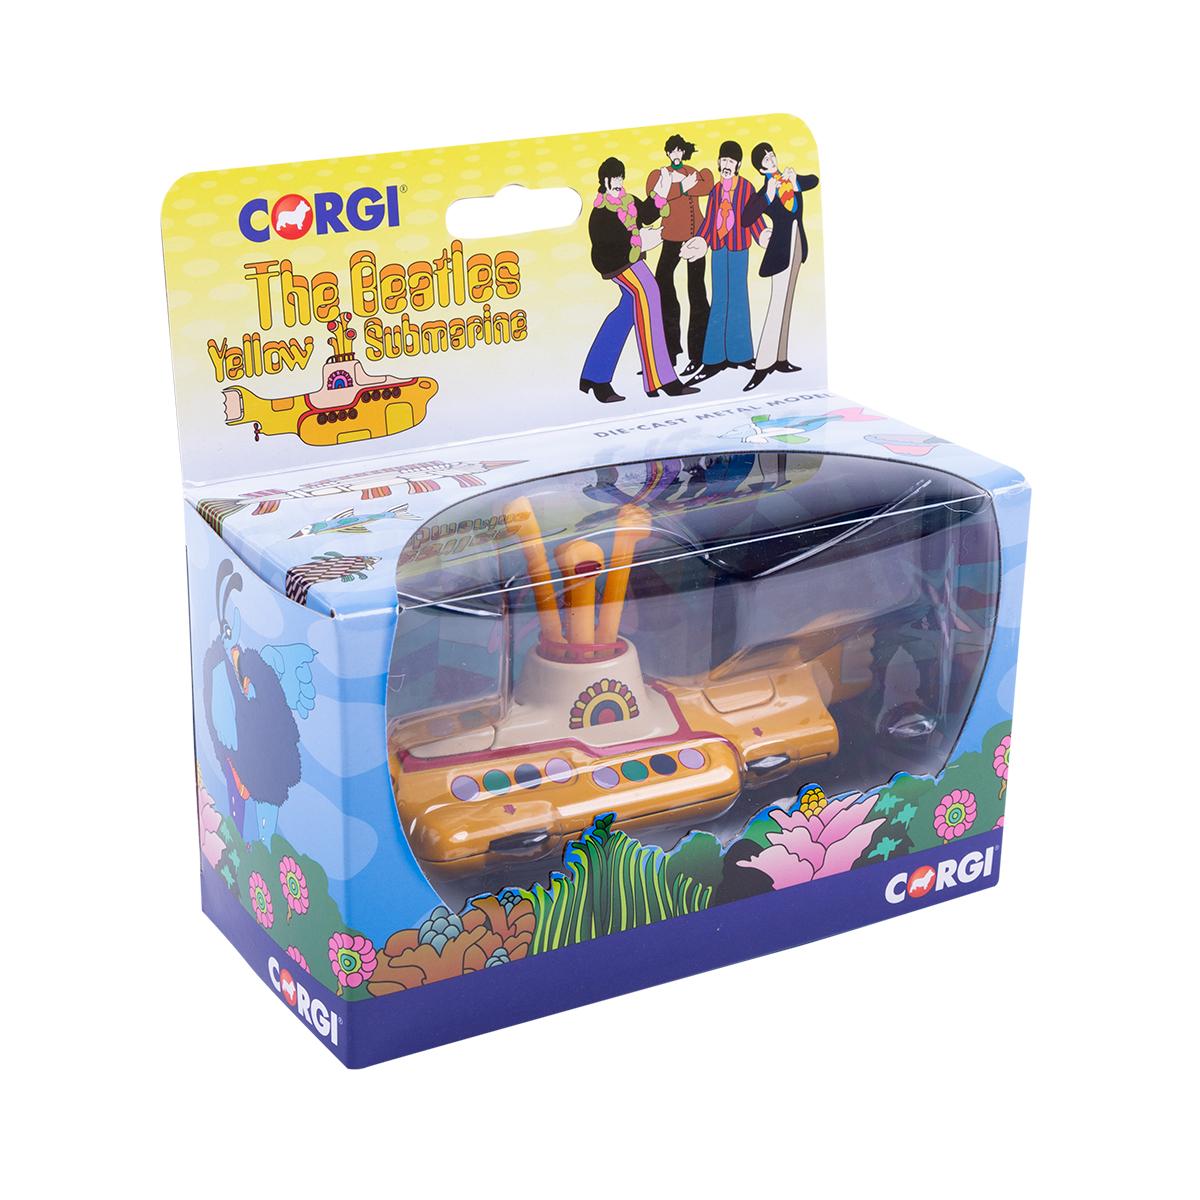 The Beatles - Yellow Submarine Diecast Model